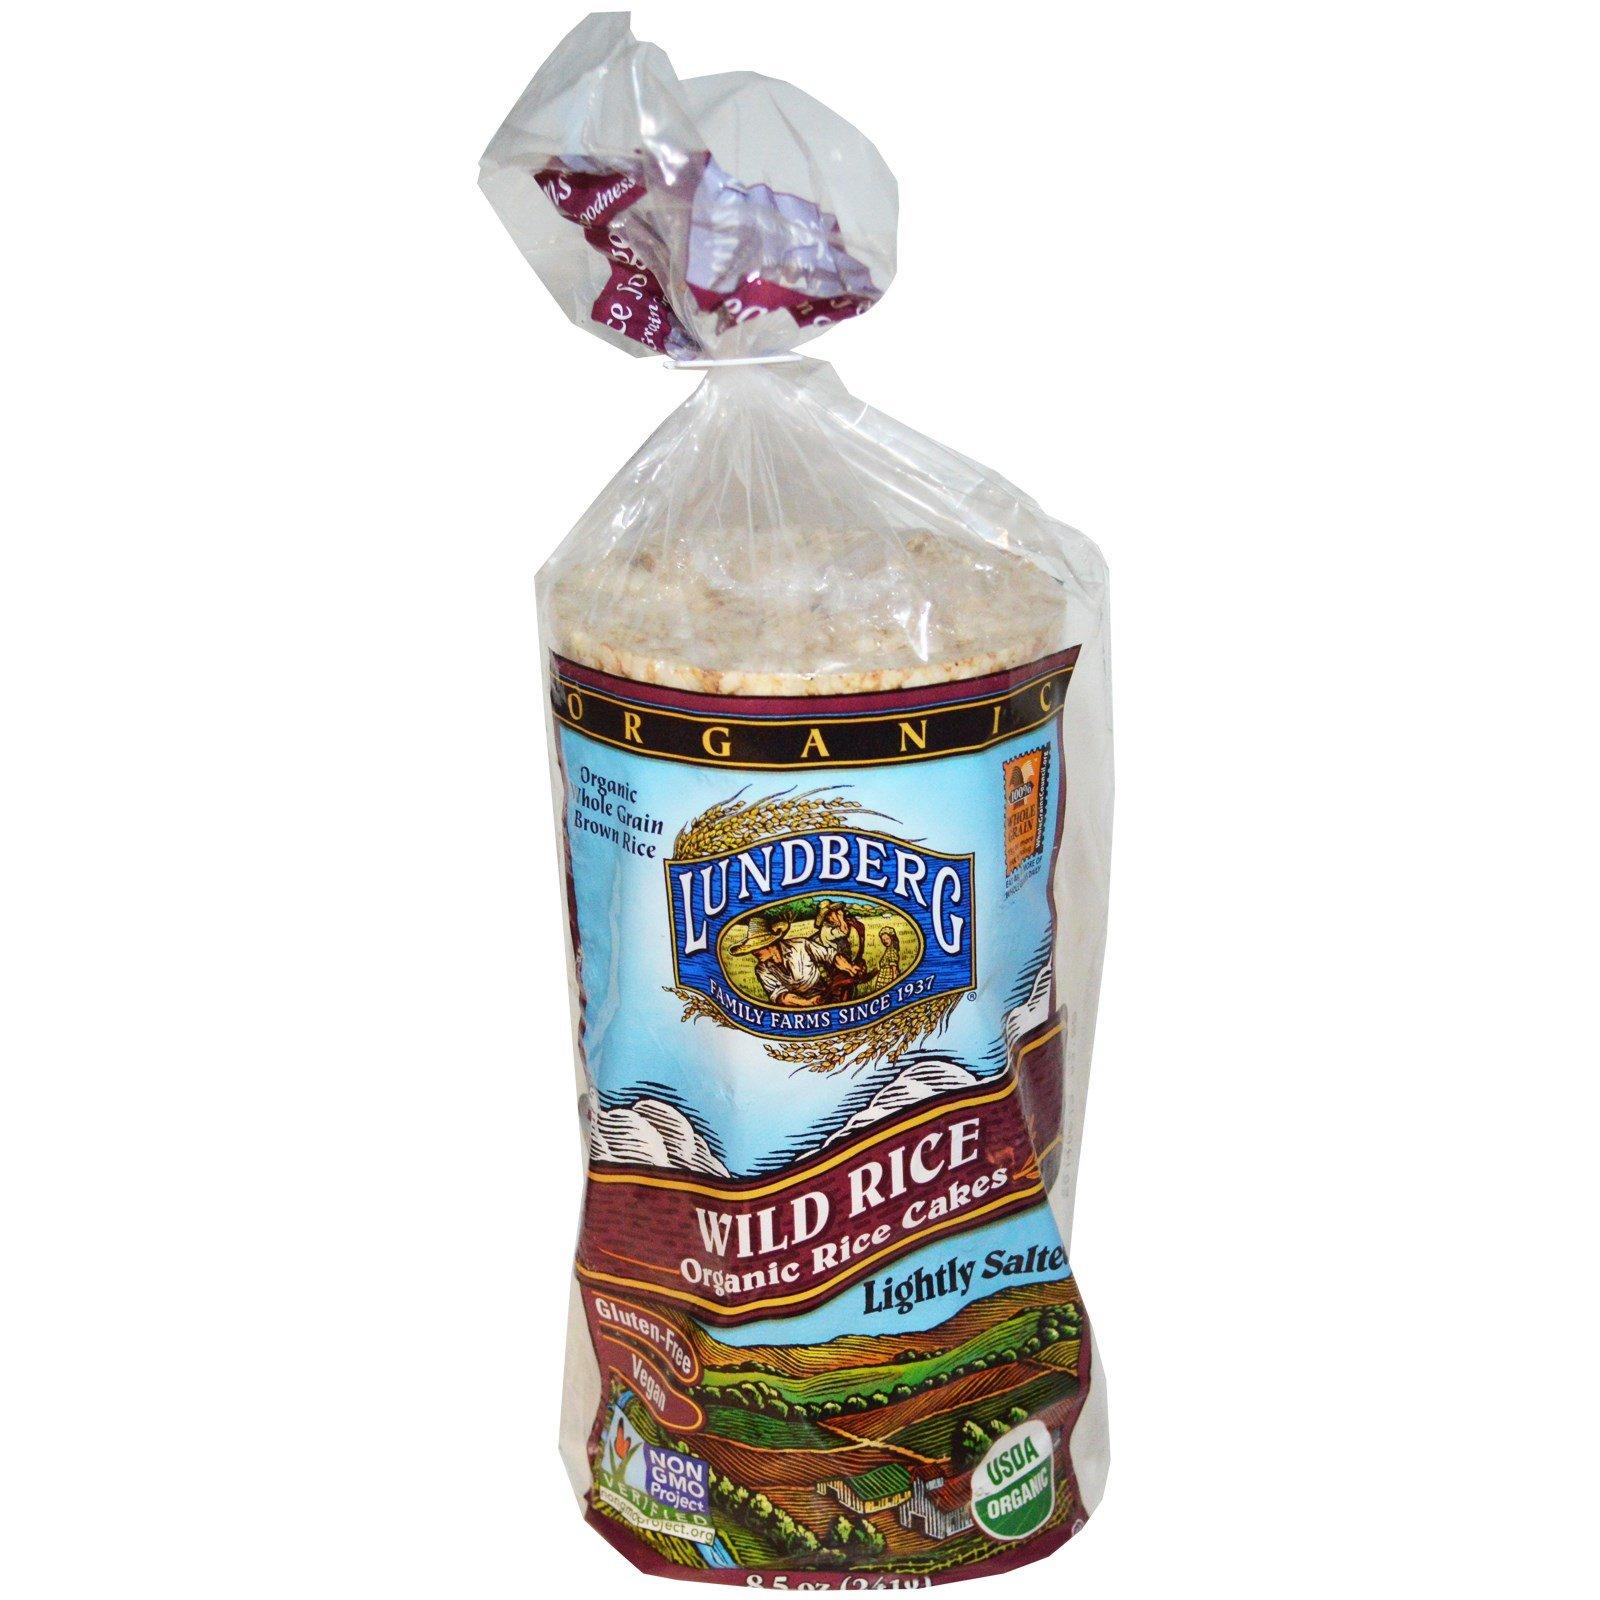 Lundberg, Wild Rice, Organic Rice Cakes, Lightly Salted, 8.5 oz(Pack of 3)